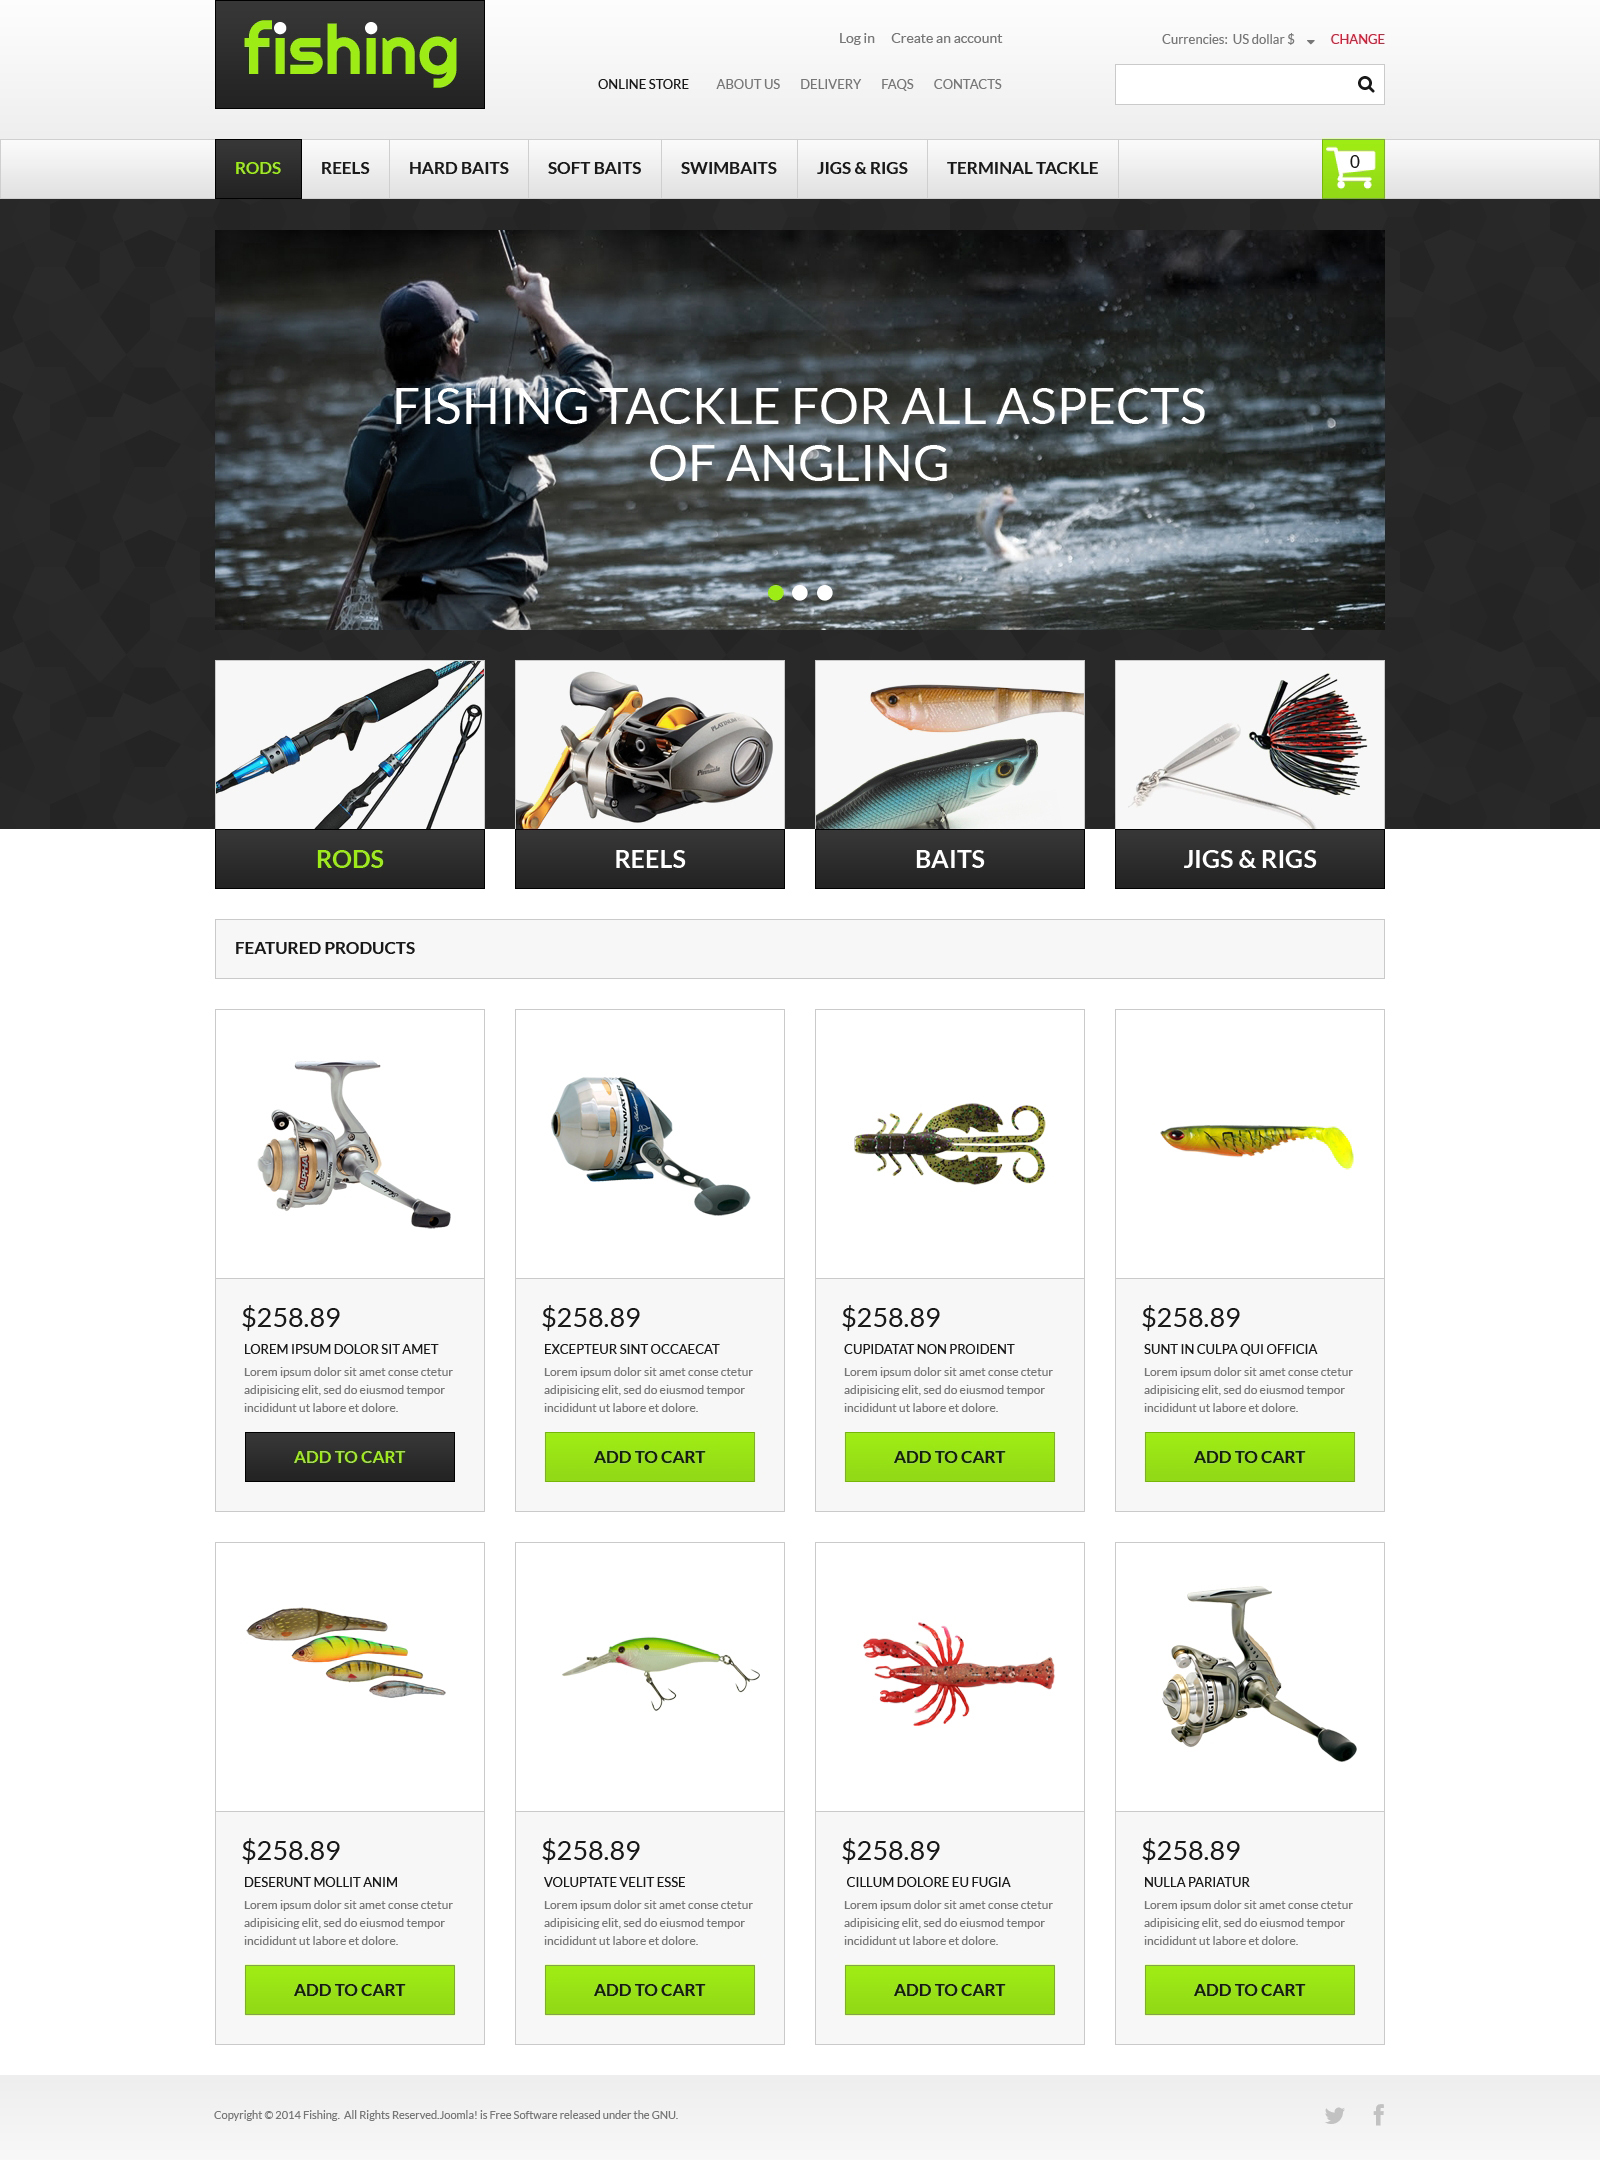 """Varity of Fishing Equipment"" - VirtueMart шаблон №49441 - скріншот"